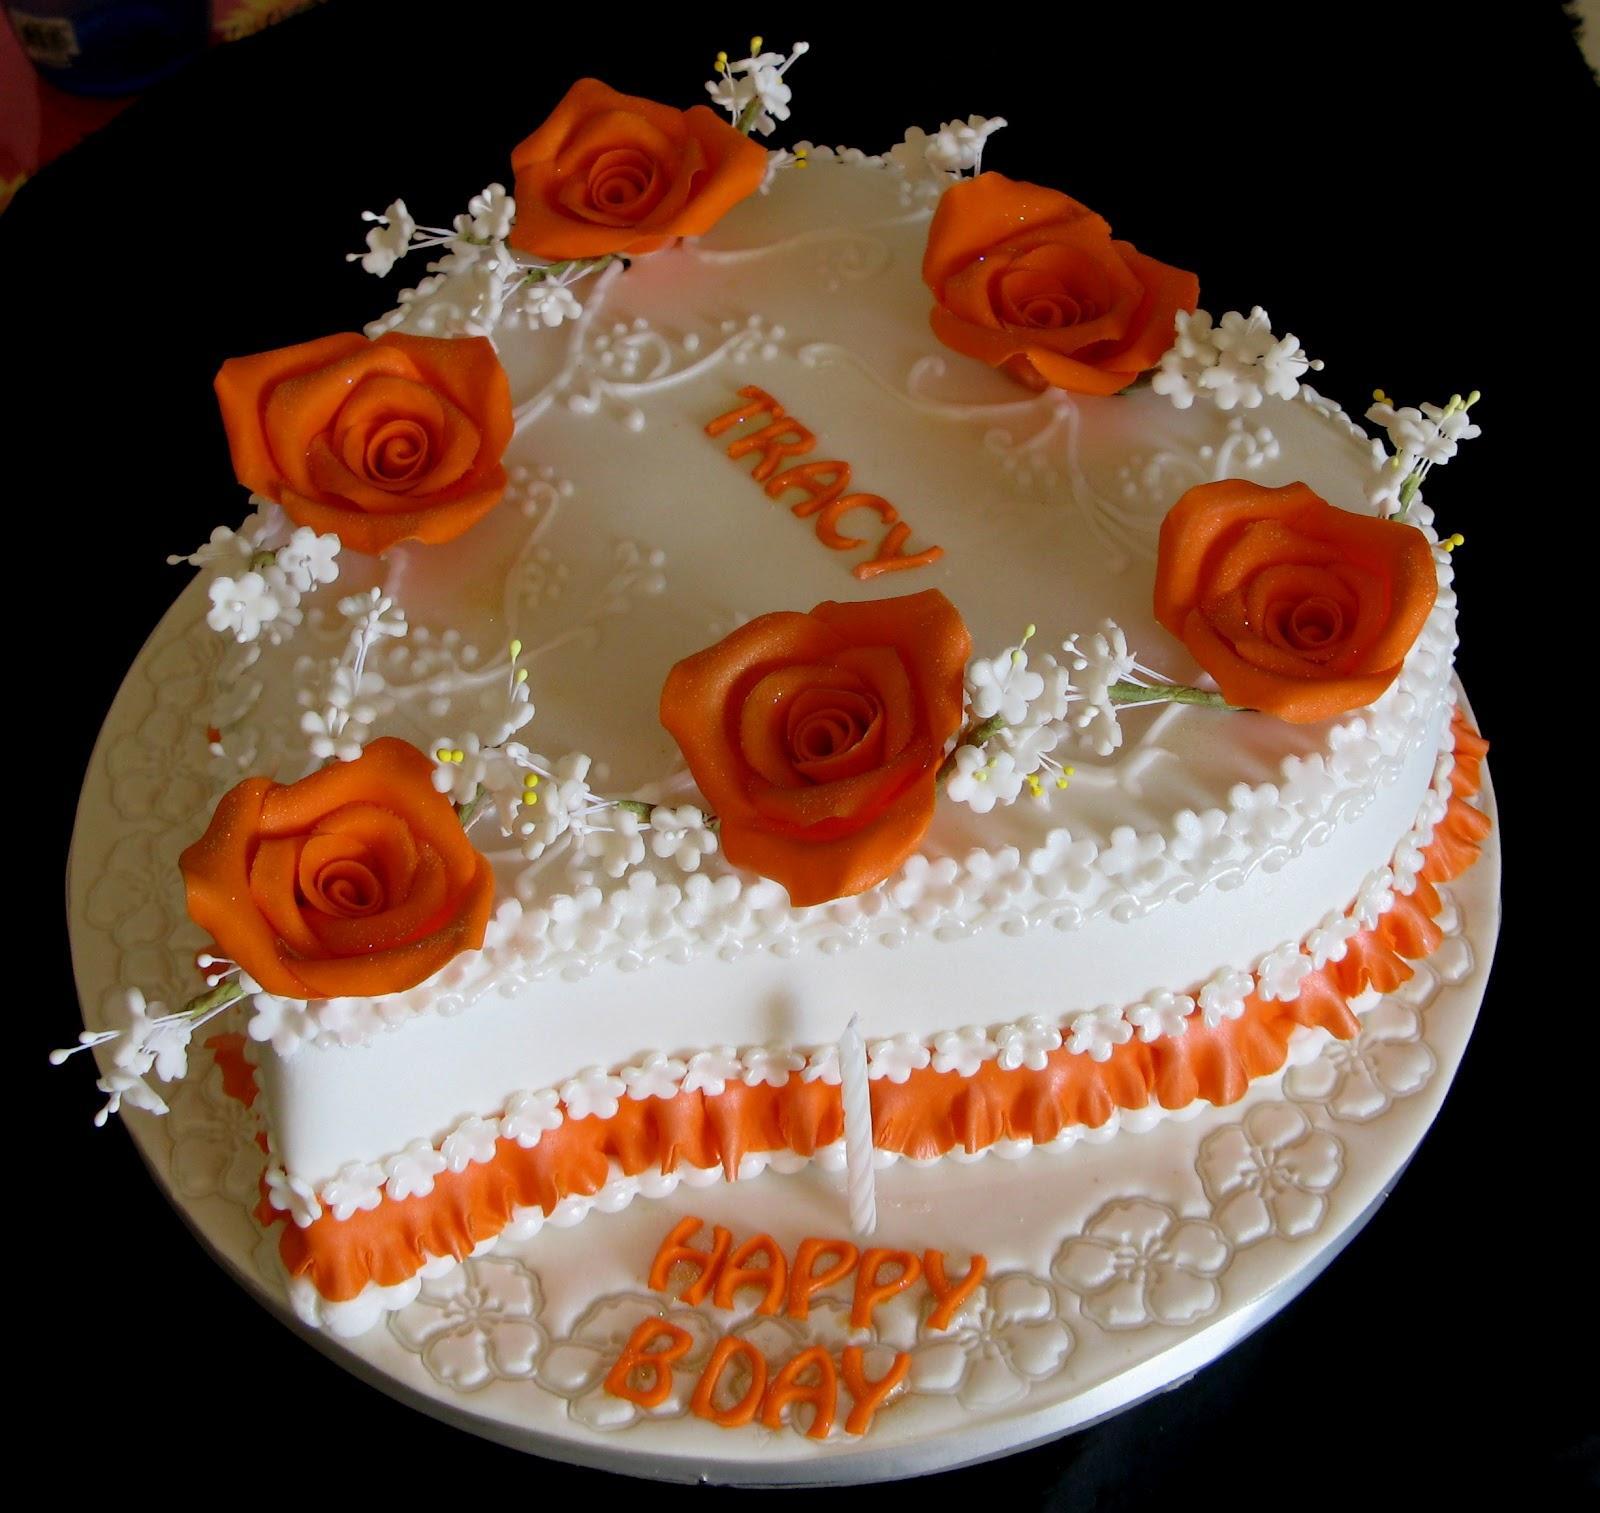 Sugarcraft By Soni: Birthday Cakes